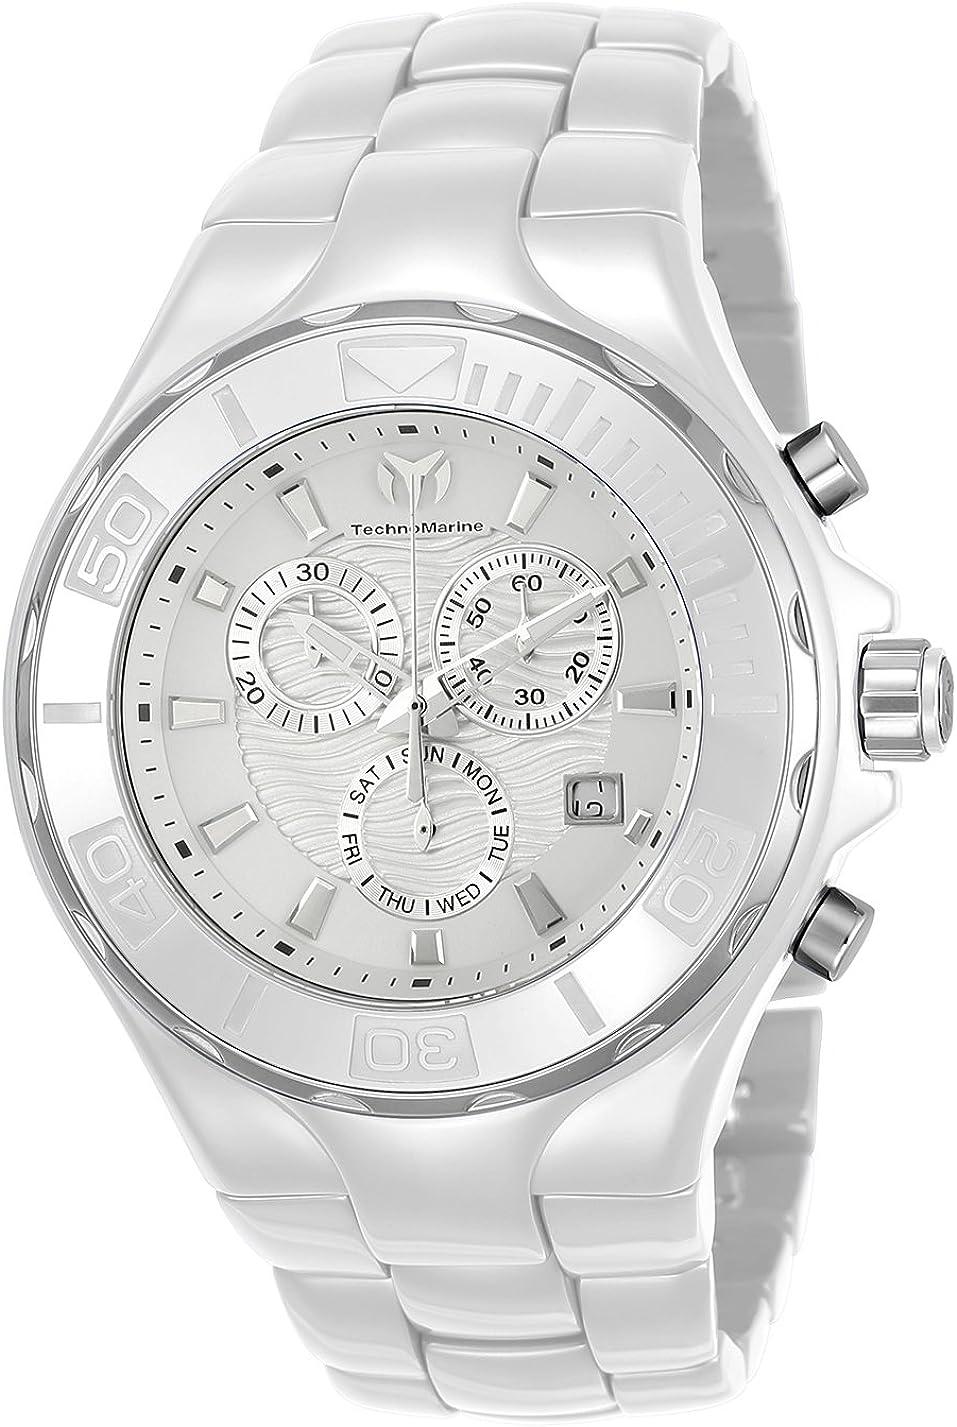 Technomarine Men s Cruise Quartz Watch with Ceramic Strap, White, 24 Model TM-115319